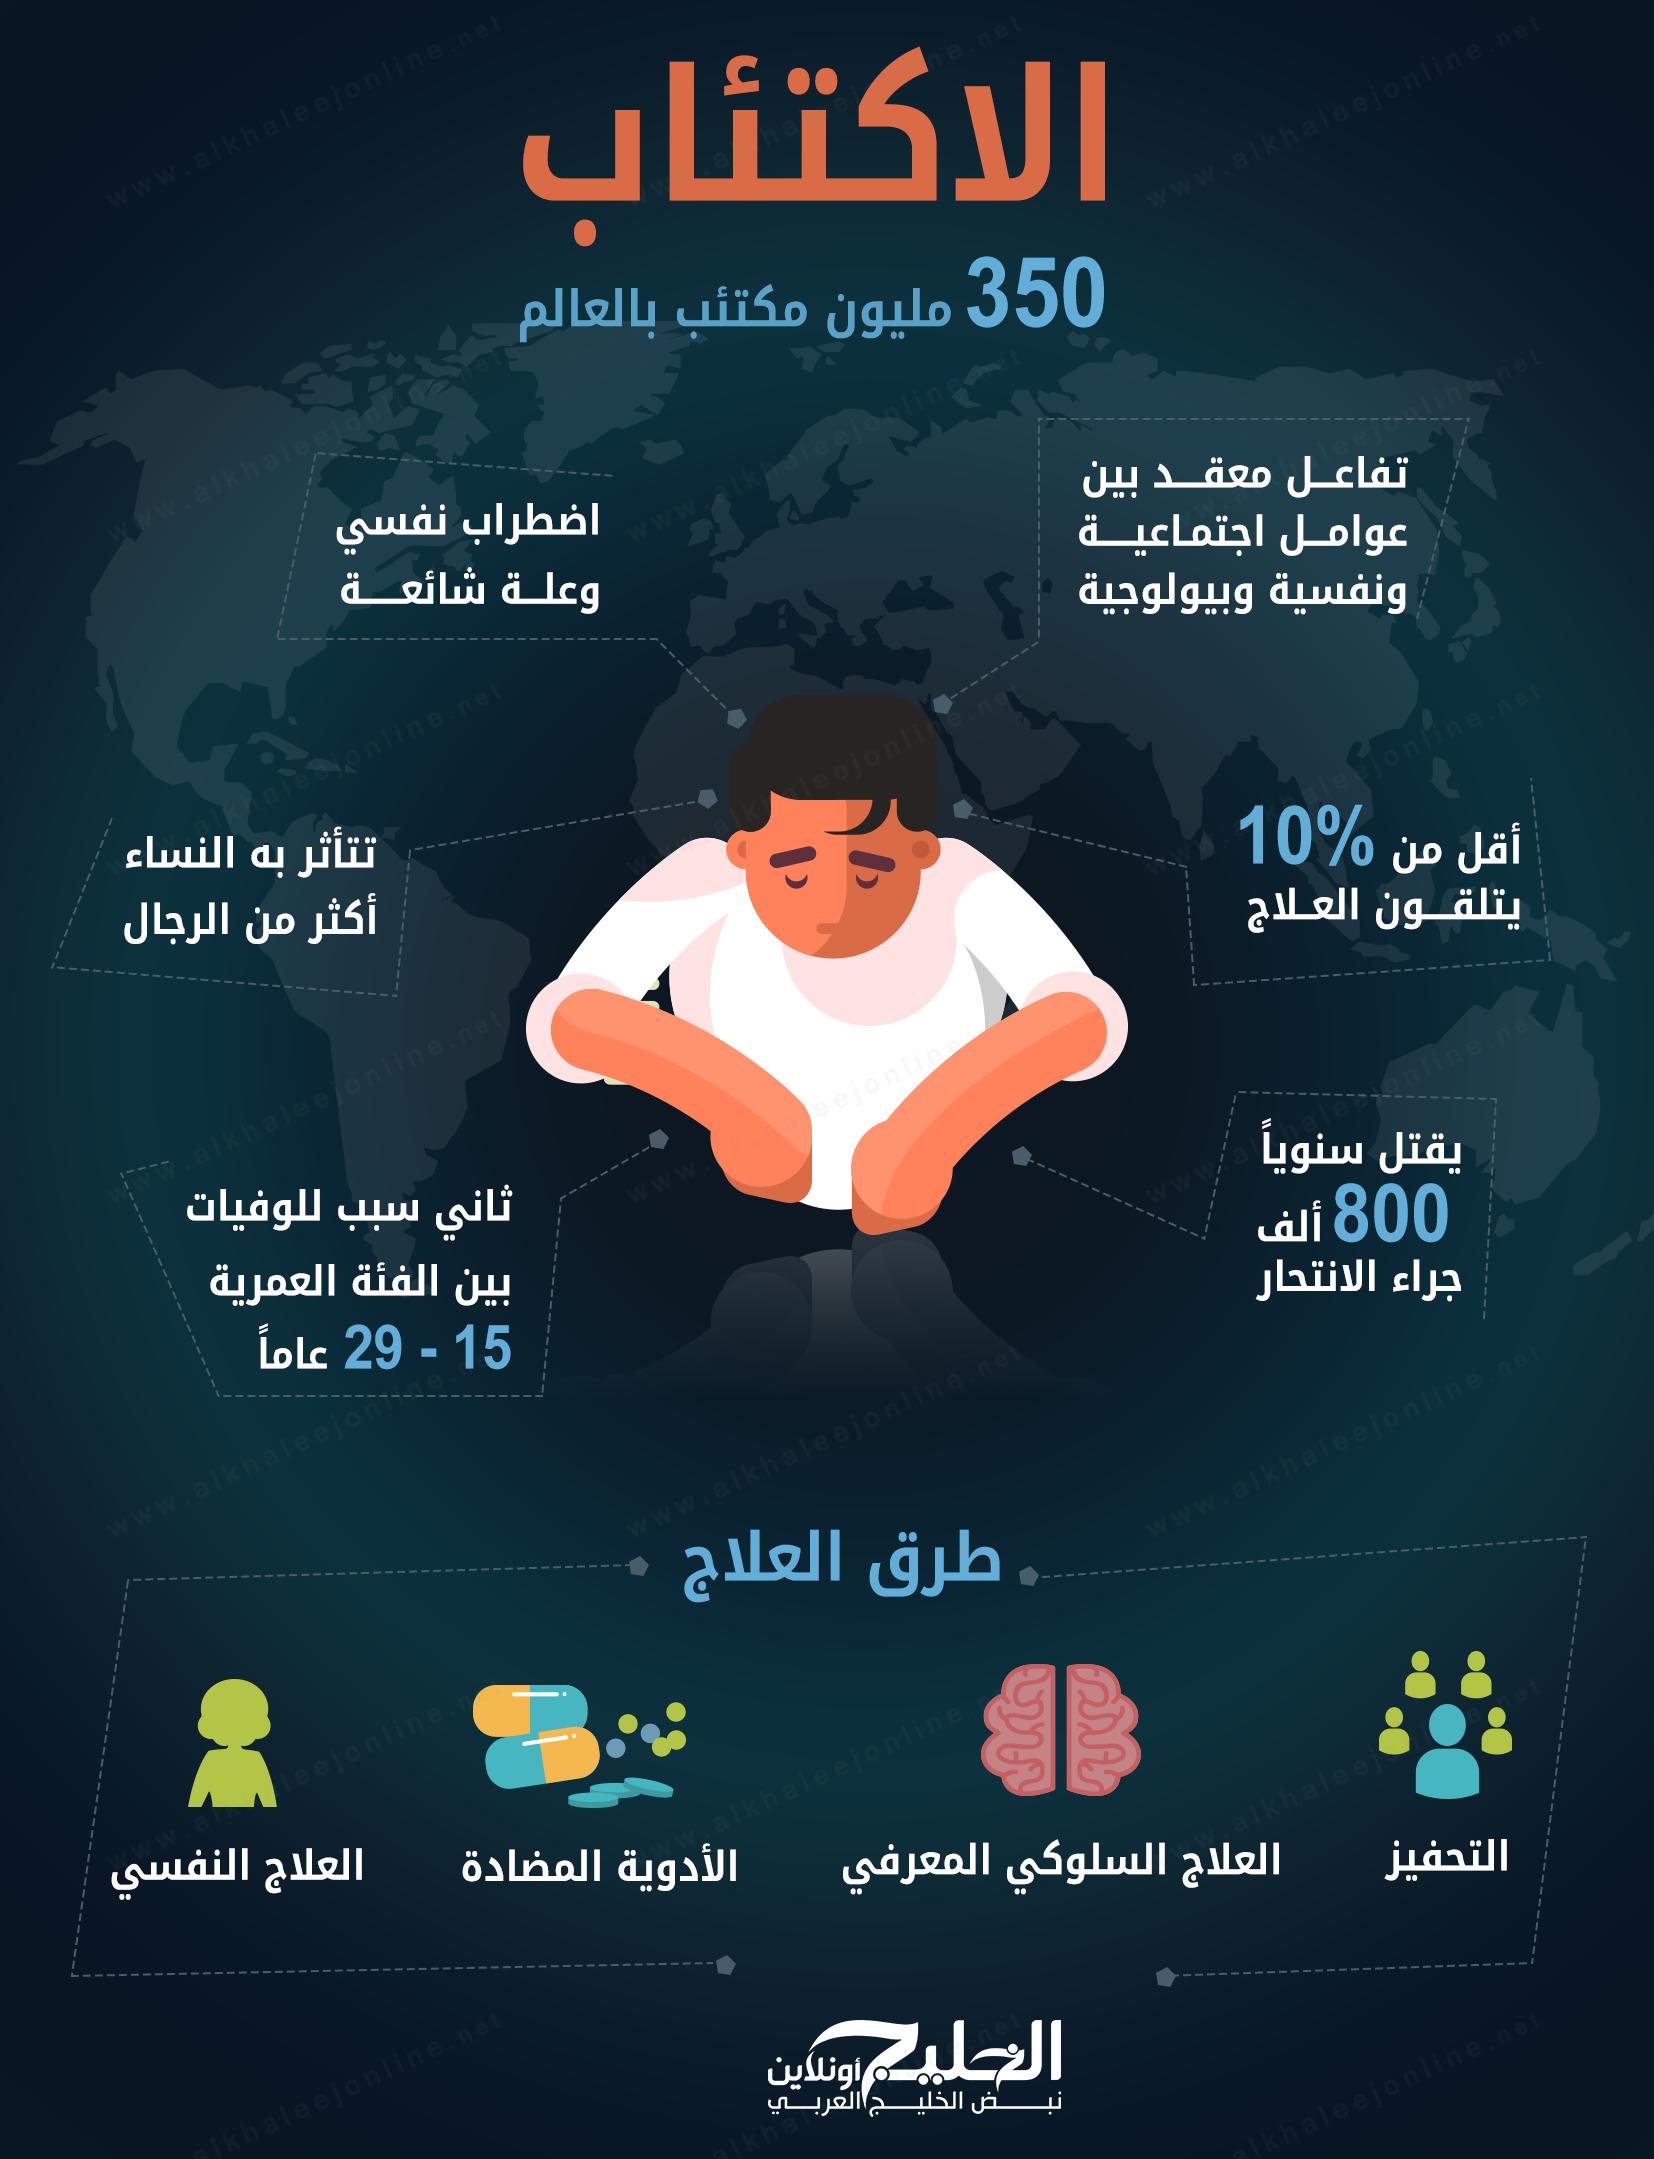 صور اسباب الاكتئاب , اسباب و علاج مرض الاكتئاب